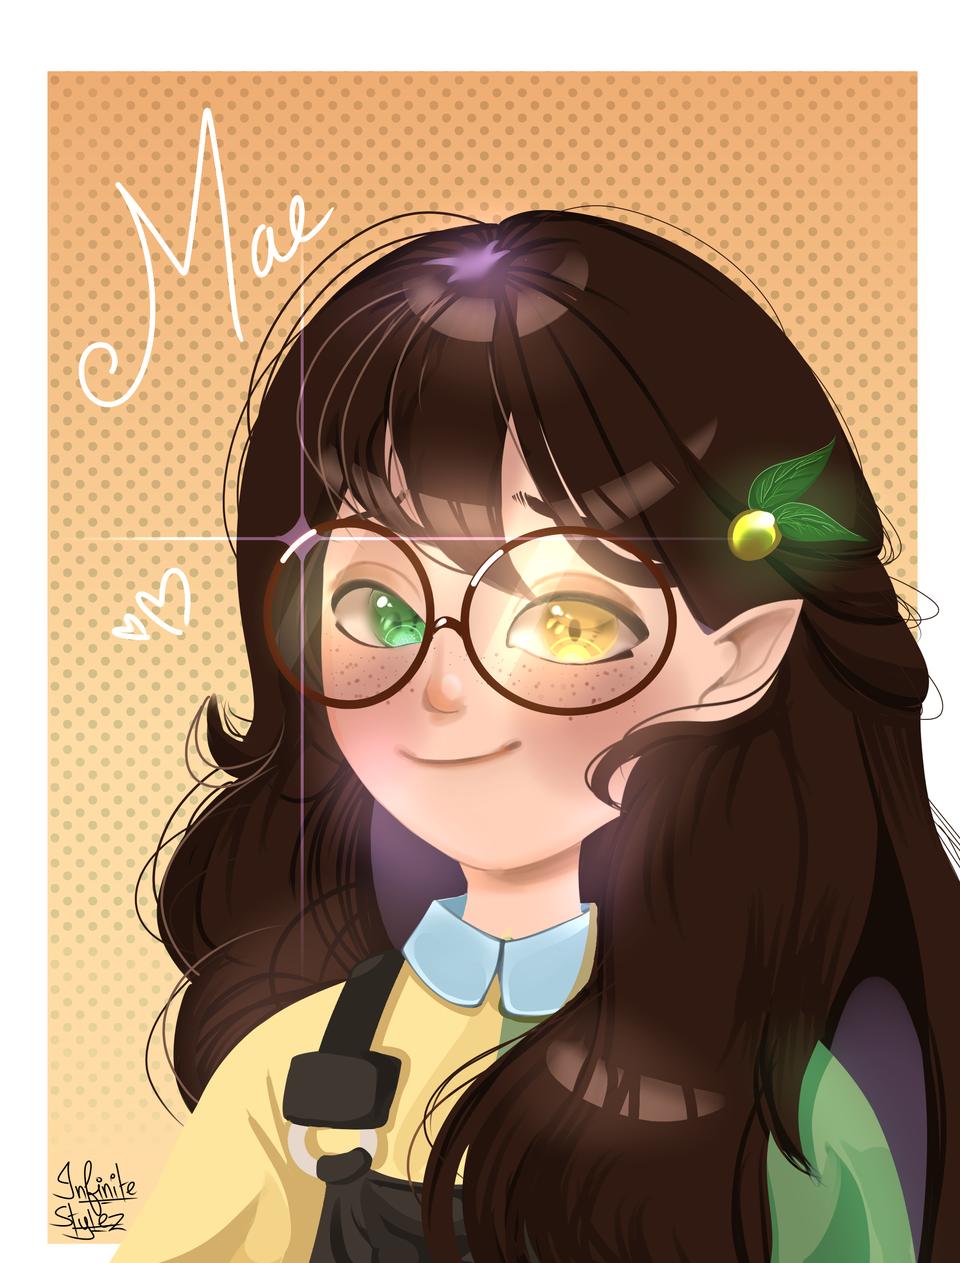 Request done for Bella! I hope ya like it ^^ Illust of Infinite stylez medibangpaint green cute infinitestylez Bella naturelover Mae